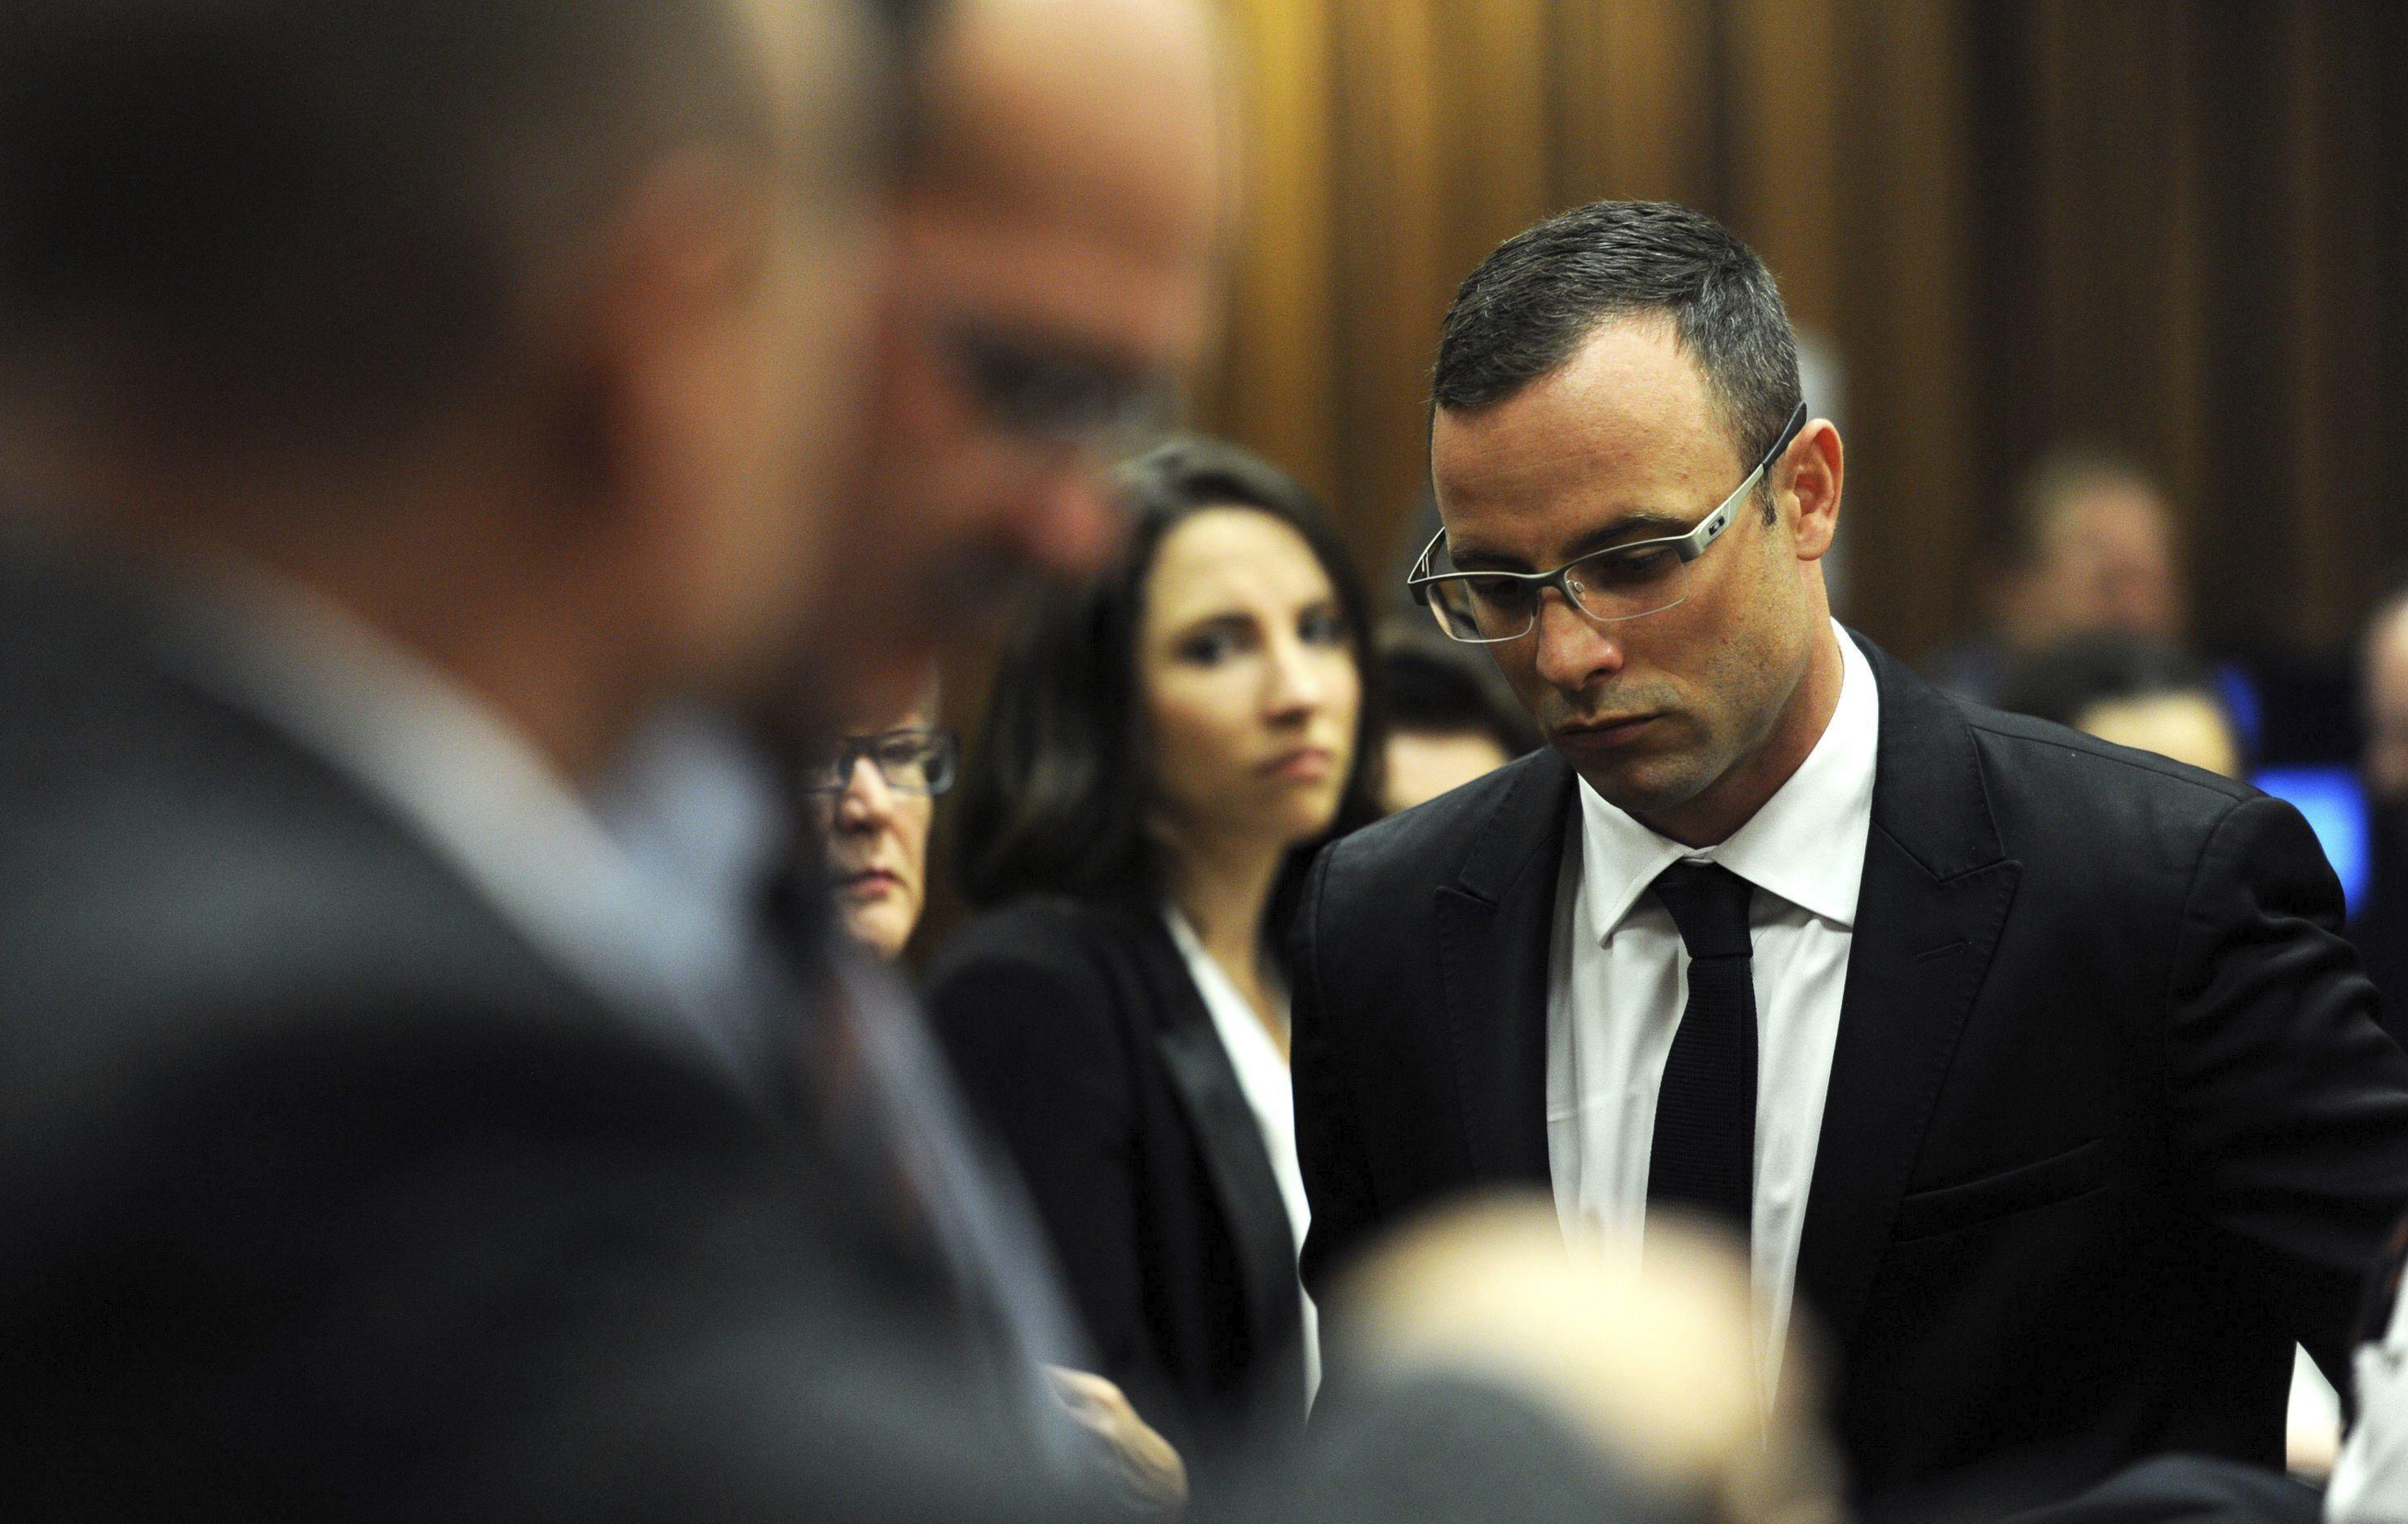 El fiscal presiona a Pistorius: «¿Cometió un error? Usted mató a una persona, eso es lo que hizo»